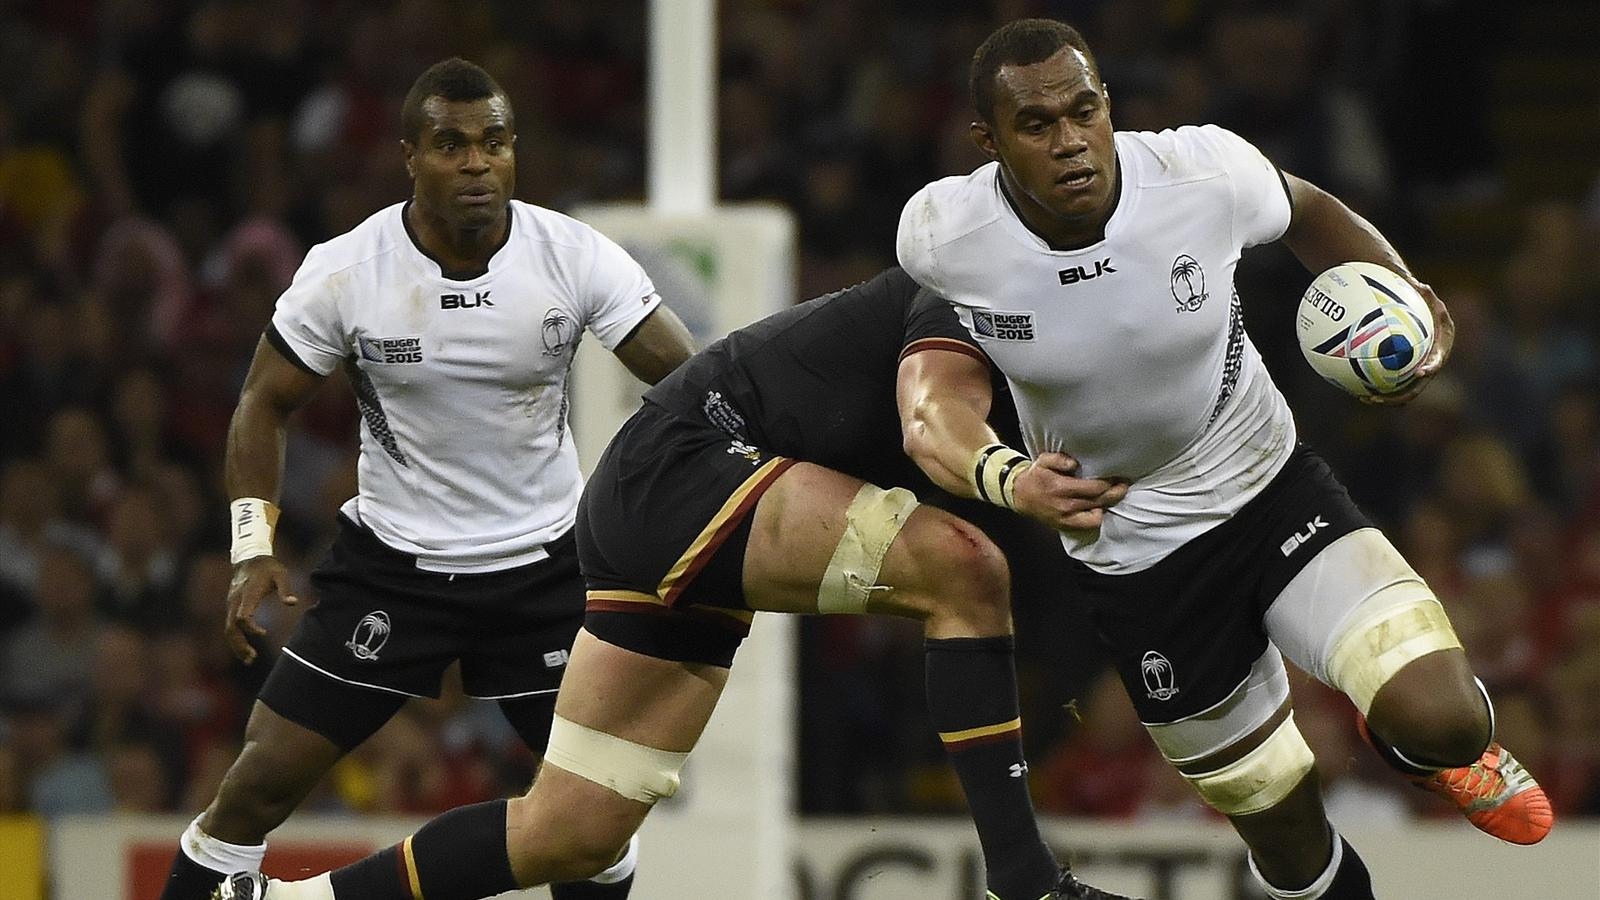 Leone Nakarawa (Fidji) face au pays de Galles - 1er octobre 2015